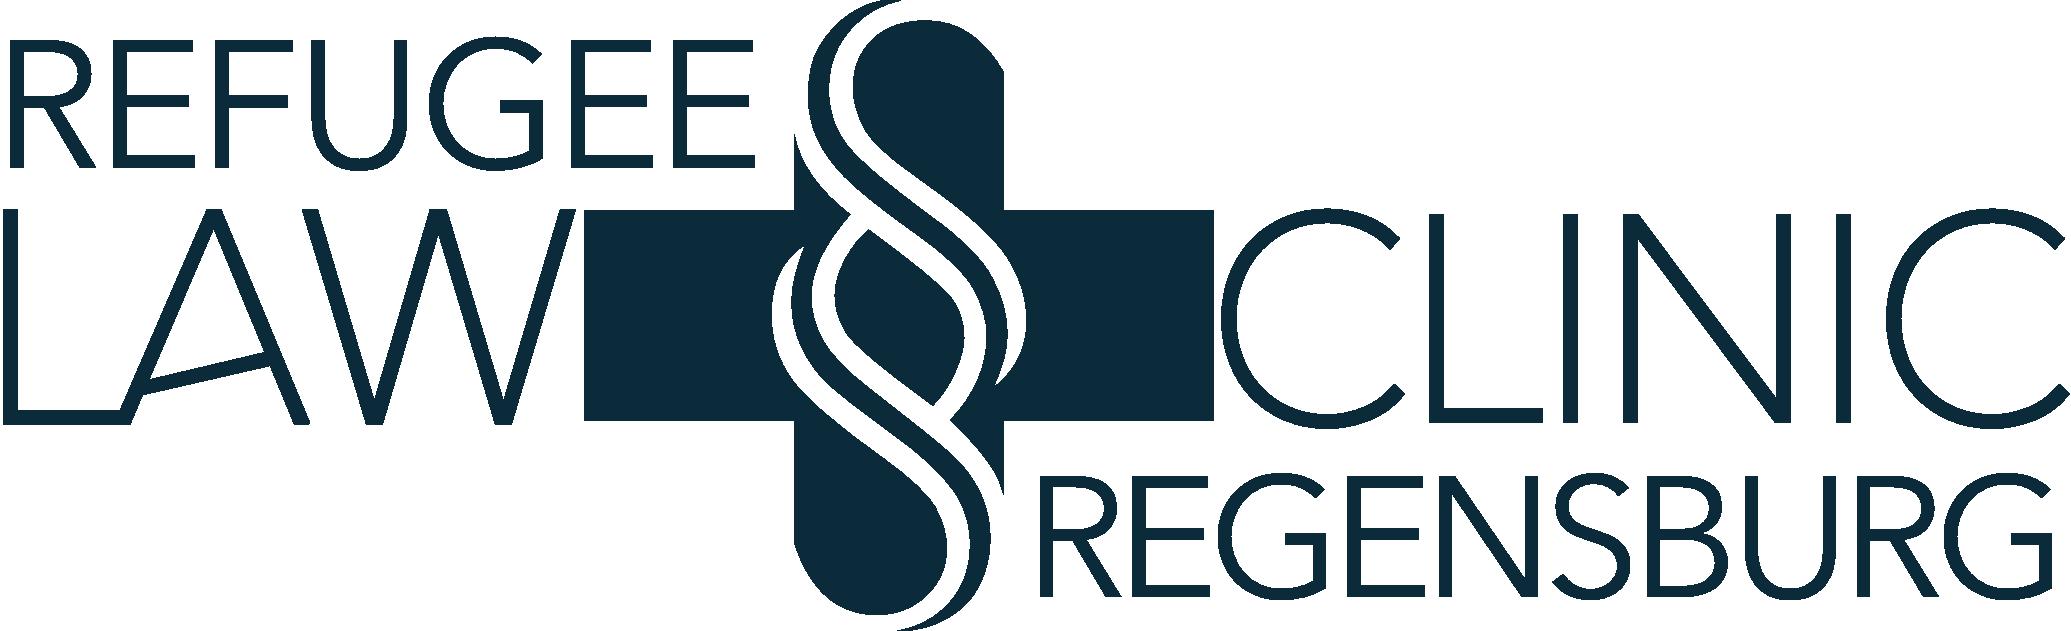 Refugee Law Clinic Regensburg